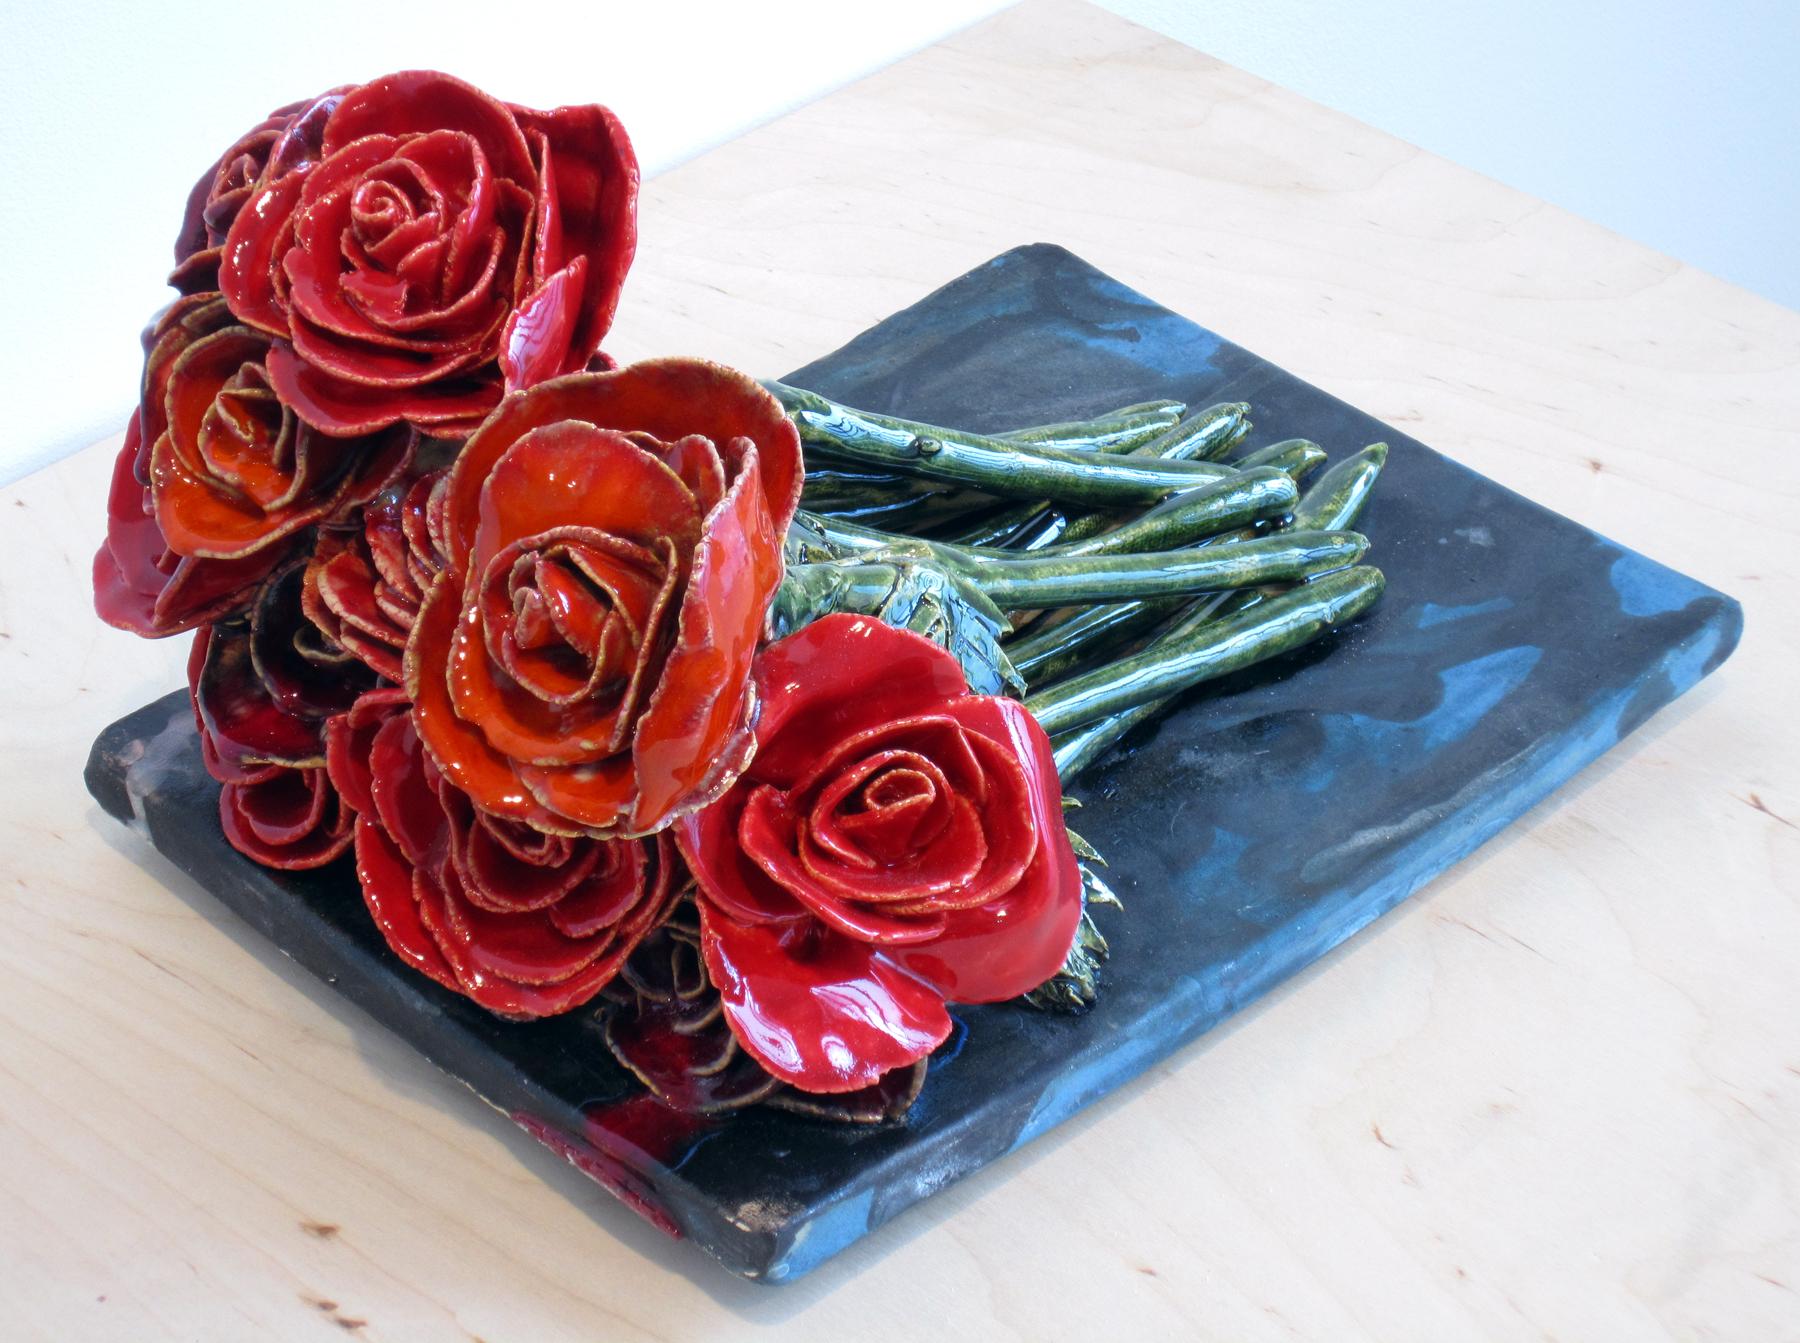 "ERIK SCOLLON   Roses, 2013, glaze and underglaze on stoneware, 7"" x 10"" x 8"""